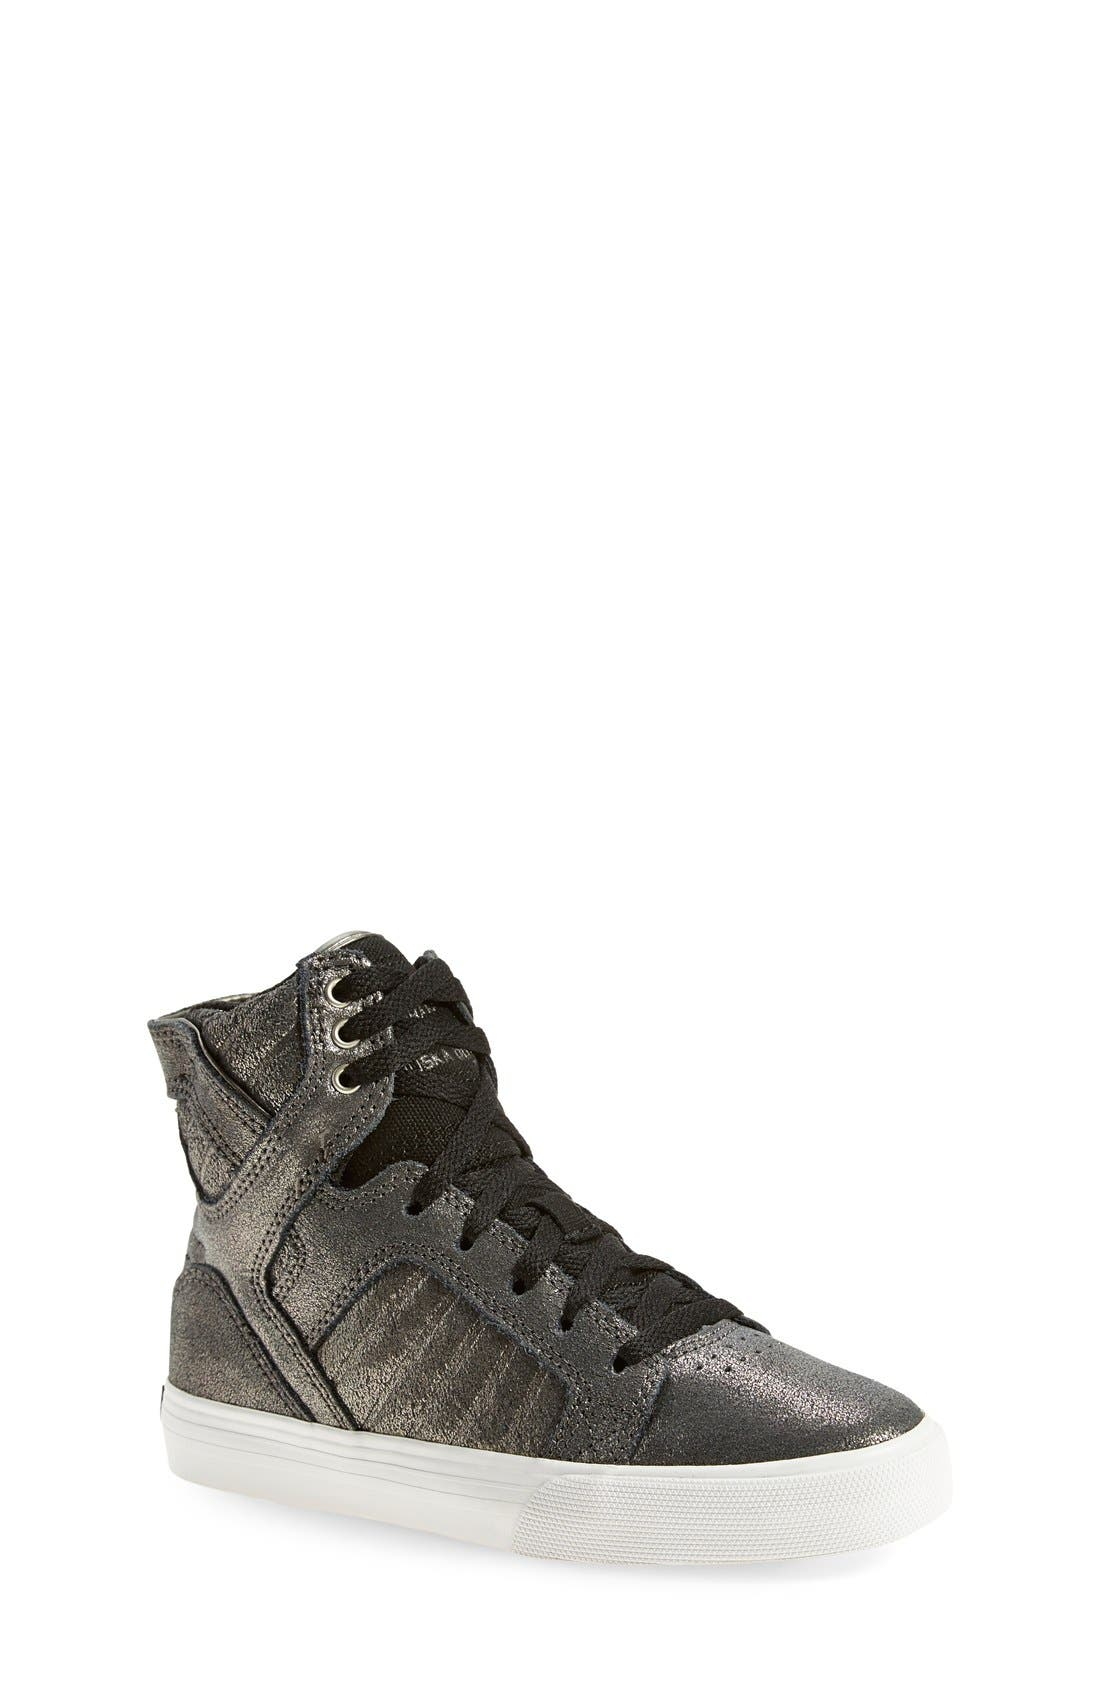 Alternate Image 1 Selected - Supra 'Skytop' High Top Sneaker (Toddler, Little Kid & Big Kid)